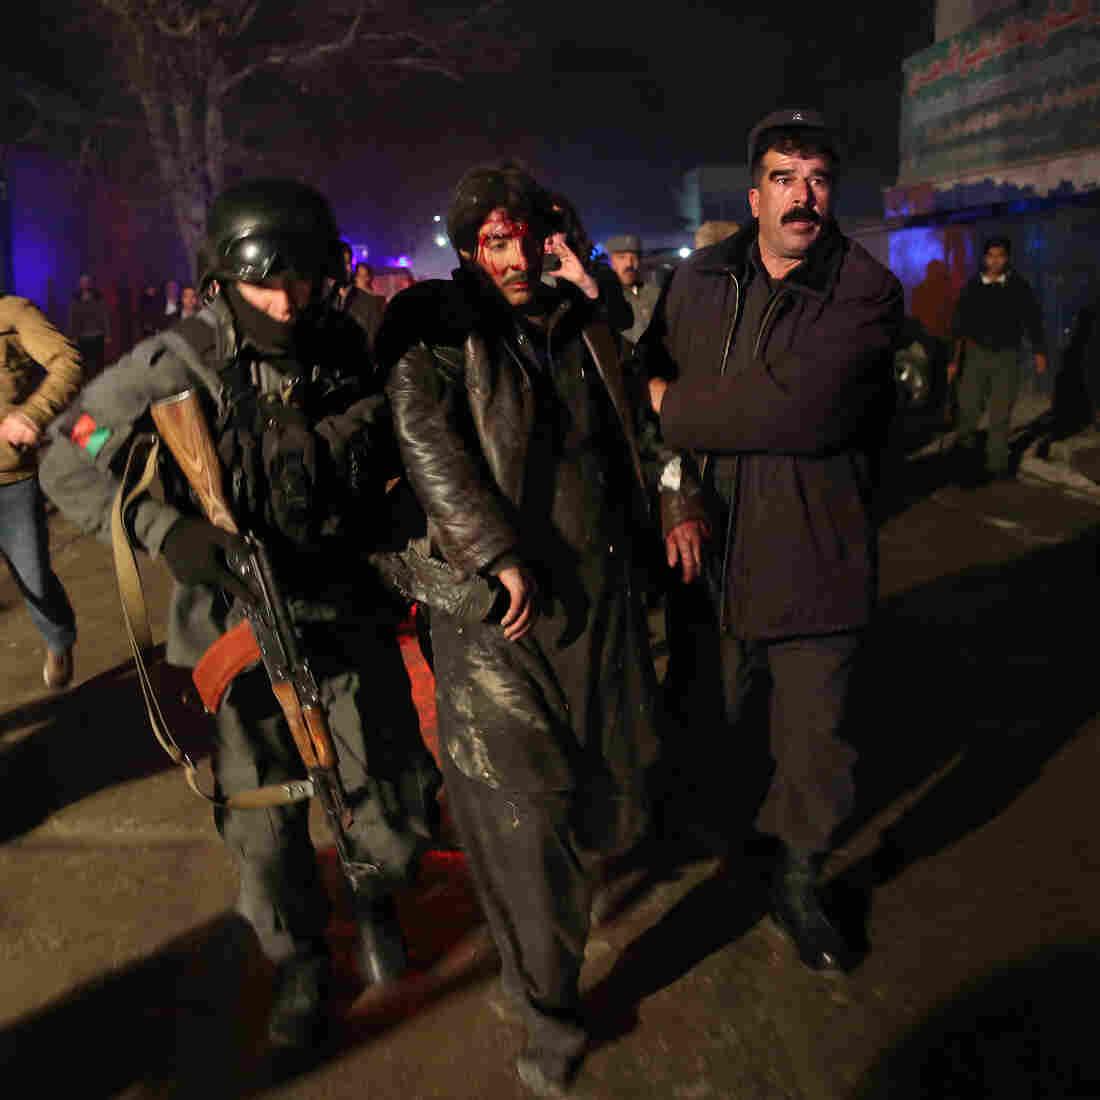 IMF, U.N. Staff Among 21 Killed In Kabul Restaurant Attack